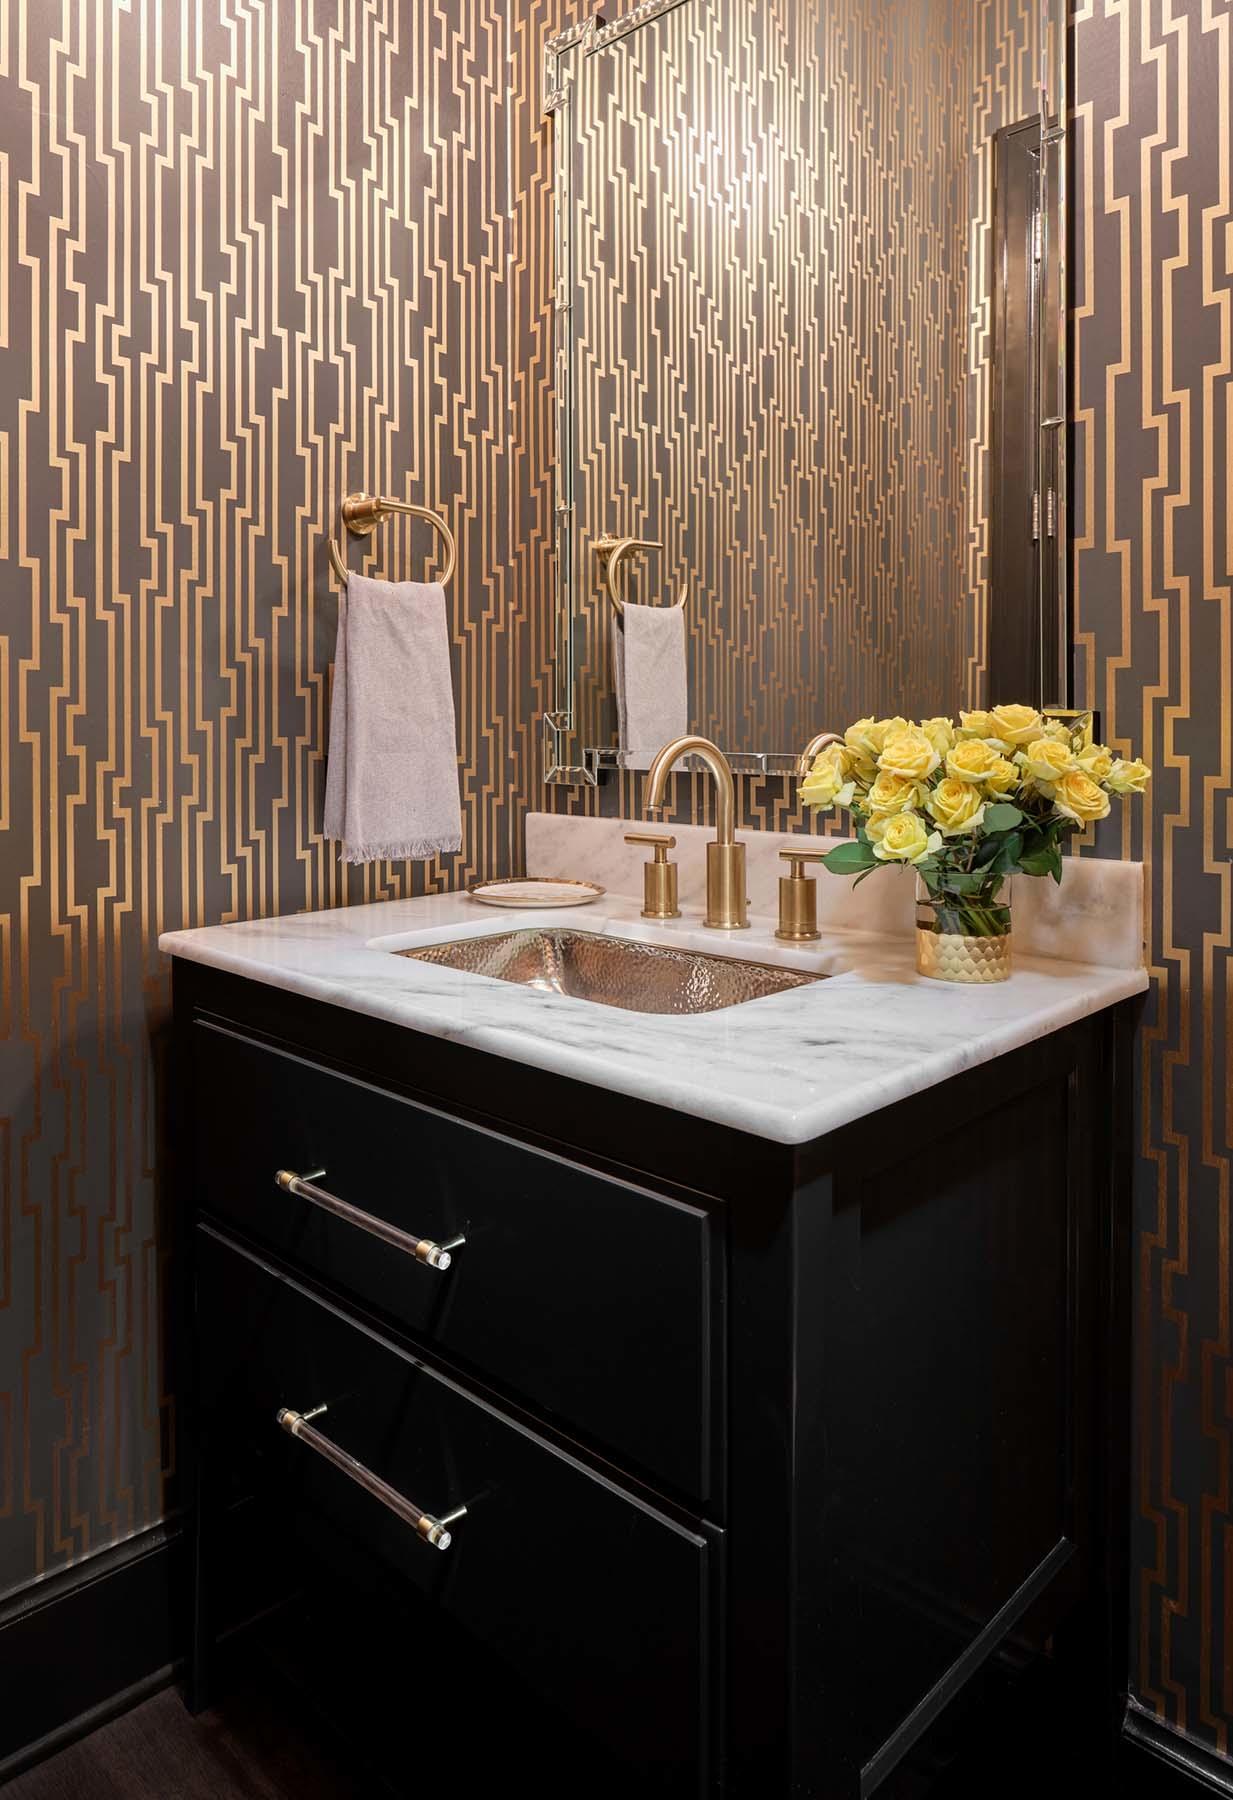 Powder bath Thibaut wallpaper install, vanity cabinet in Sherwin Williams 6258 Tricorn Black, Alamo Heights TX wallpaper installer